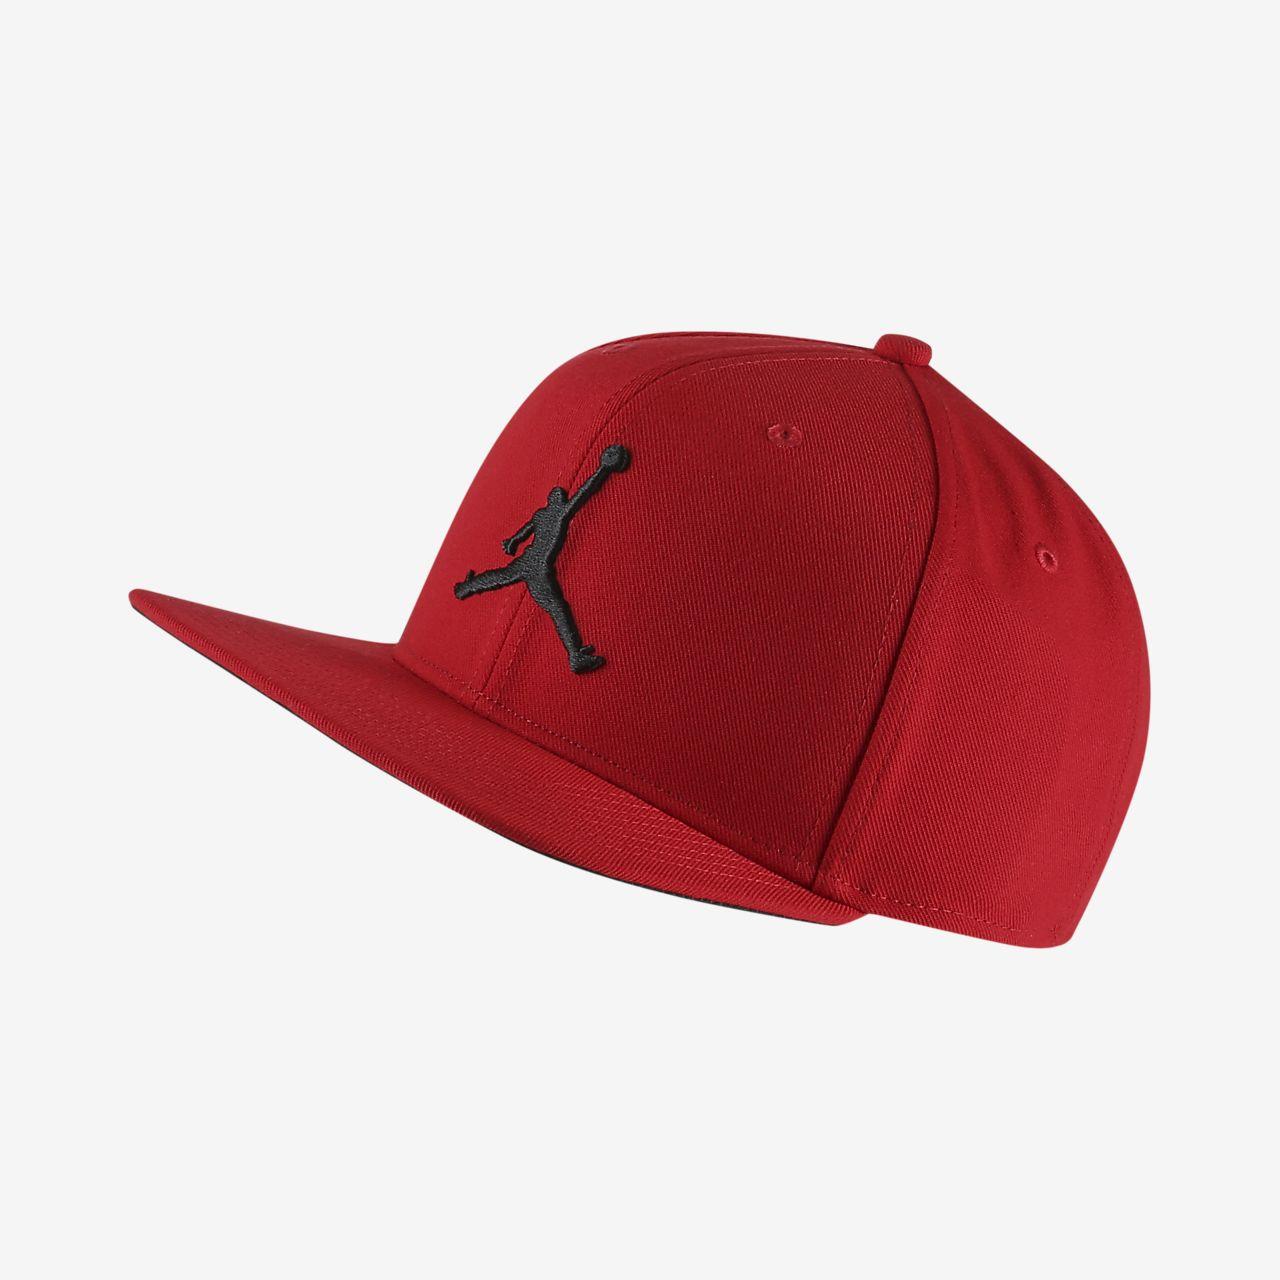 Toddler boys Jordan Snapback hat